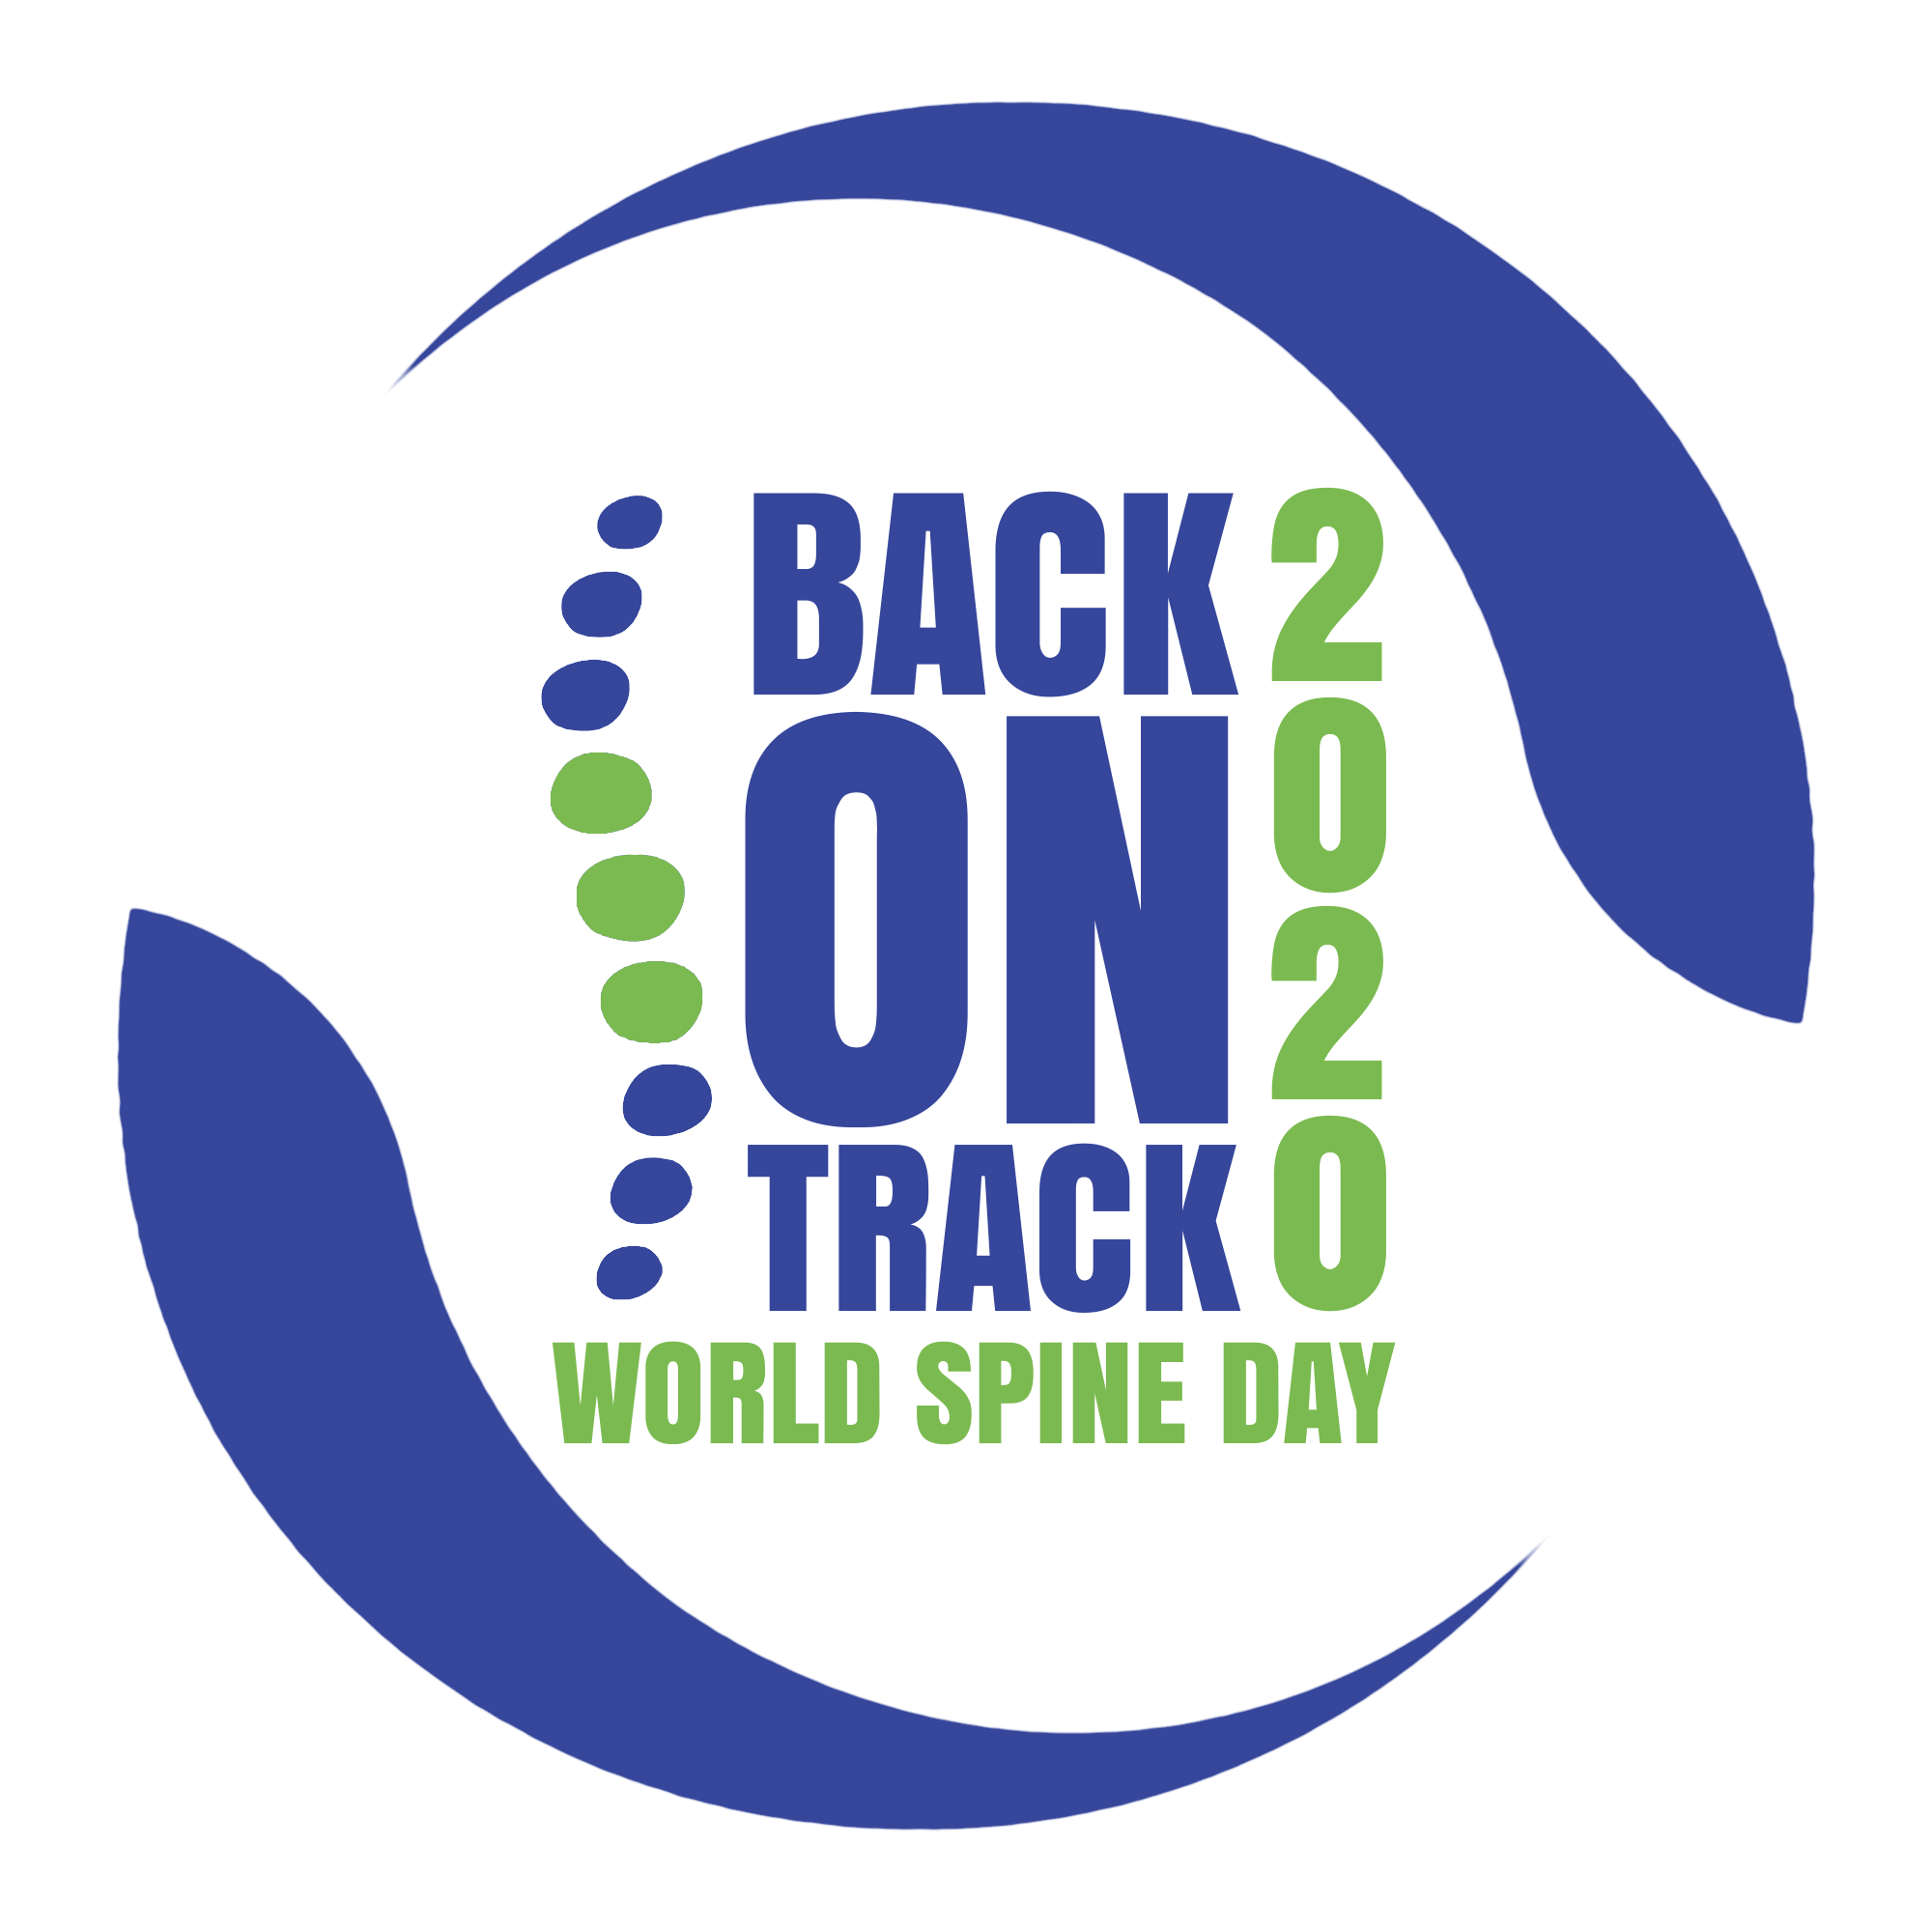 World Spine Day Celebrating Spinal Health Awareness Worldwide